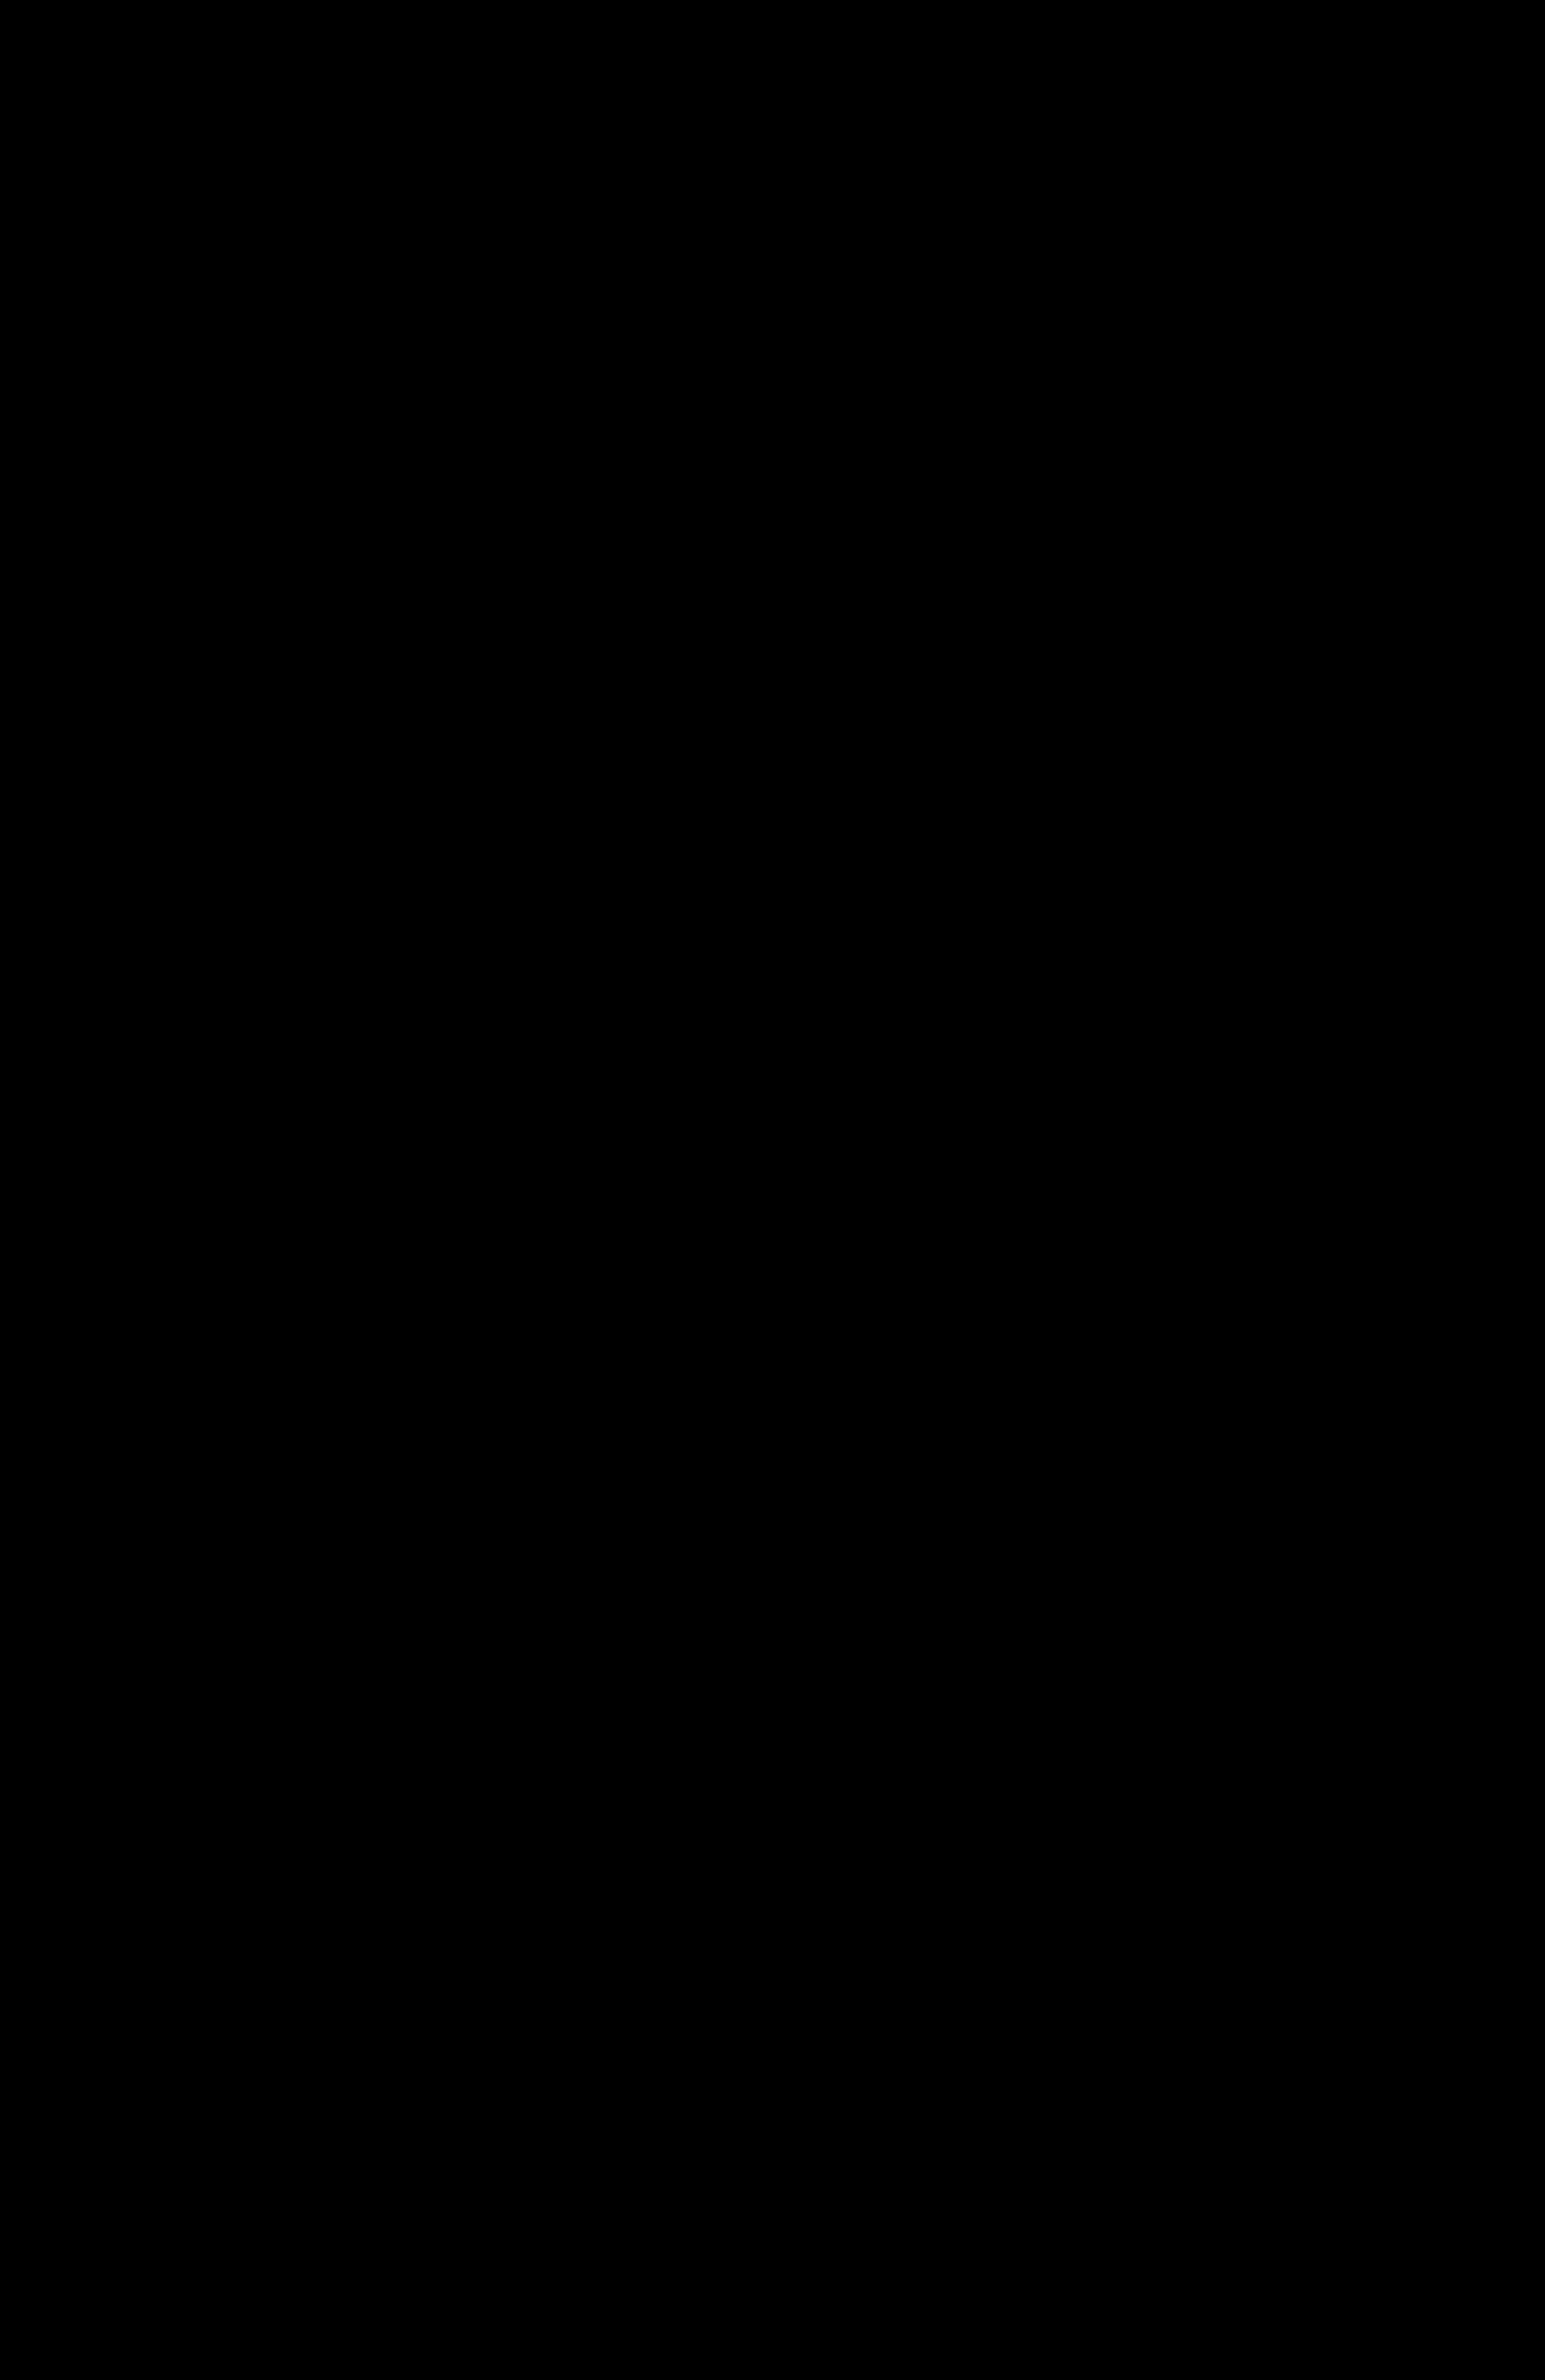 Clock clipart triangle. File isosceles svg wikimedia